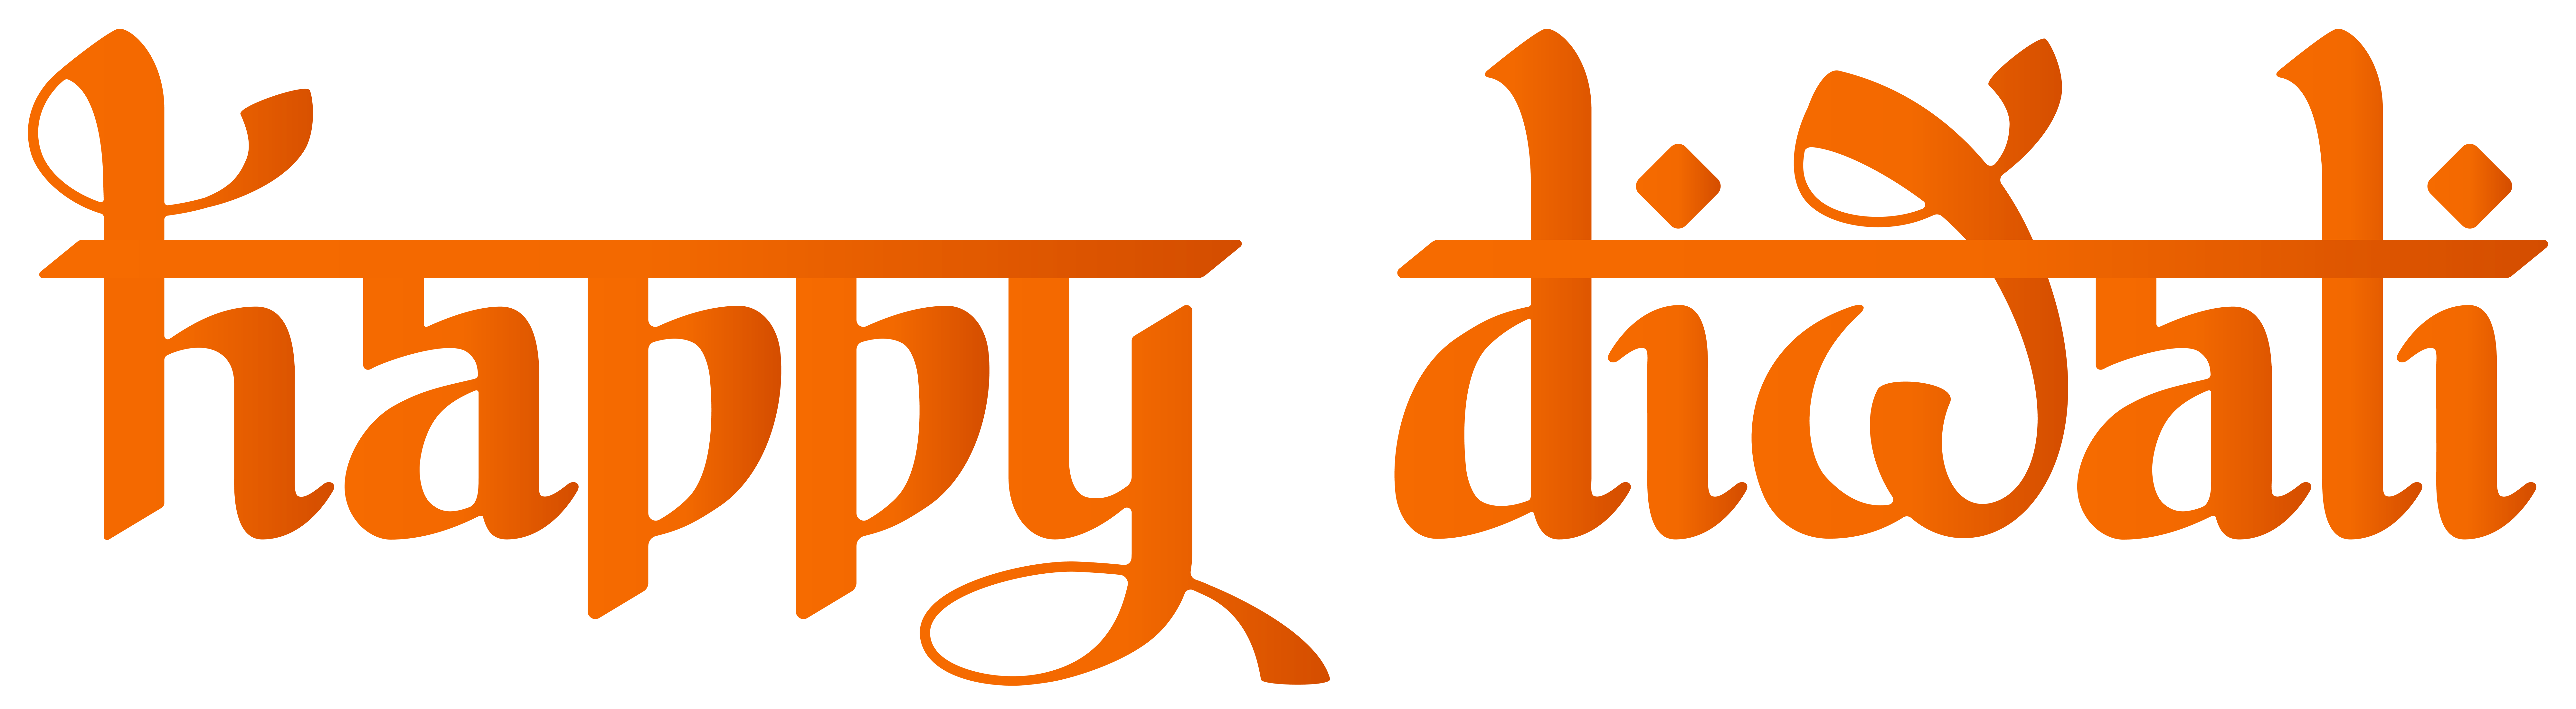 Diwali clipart frames clip freeuse download Pin by shekhar on Happy diwali | Happy diwali, Art images, Diwali clip freeuse download